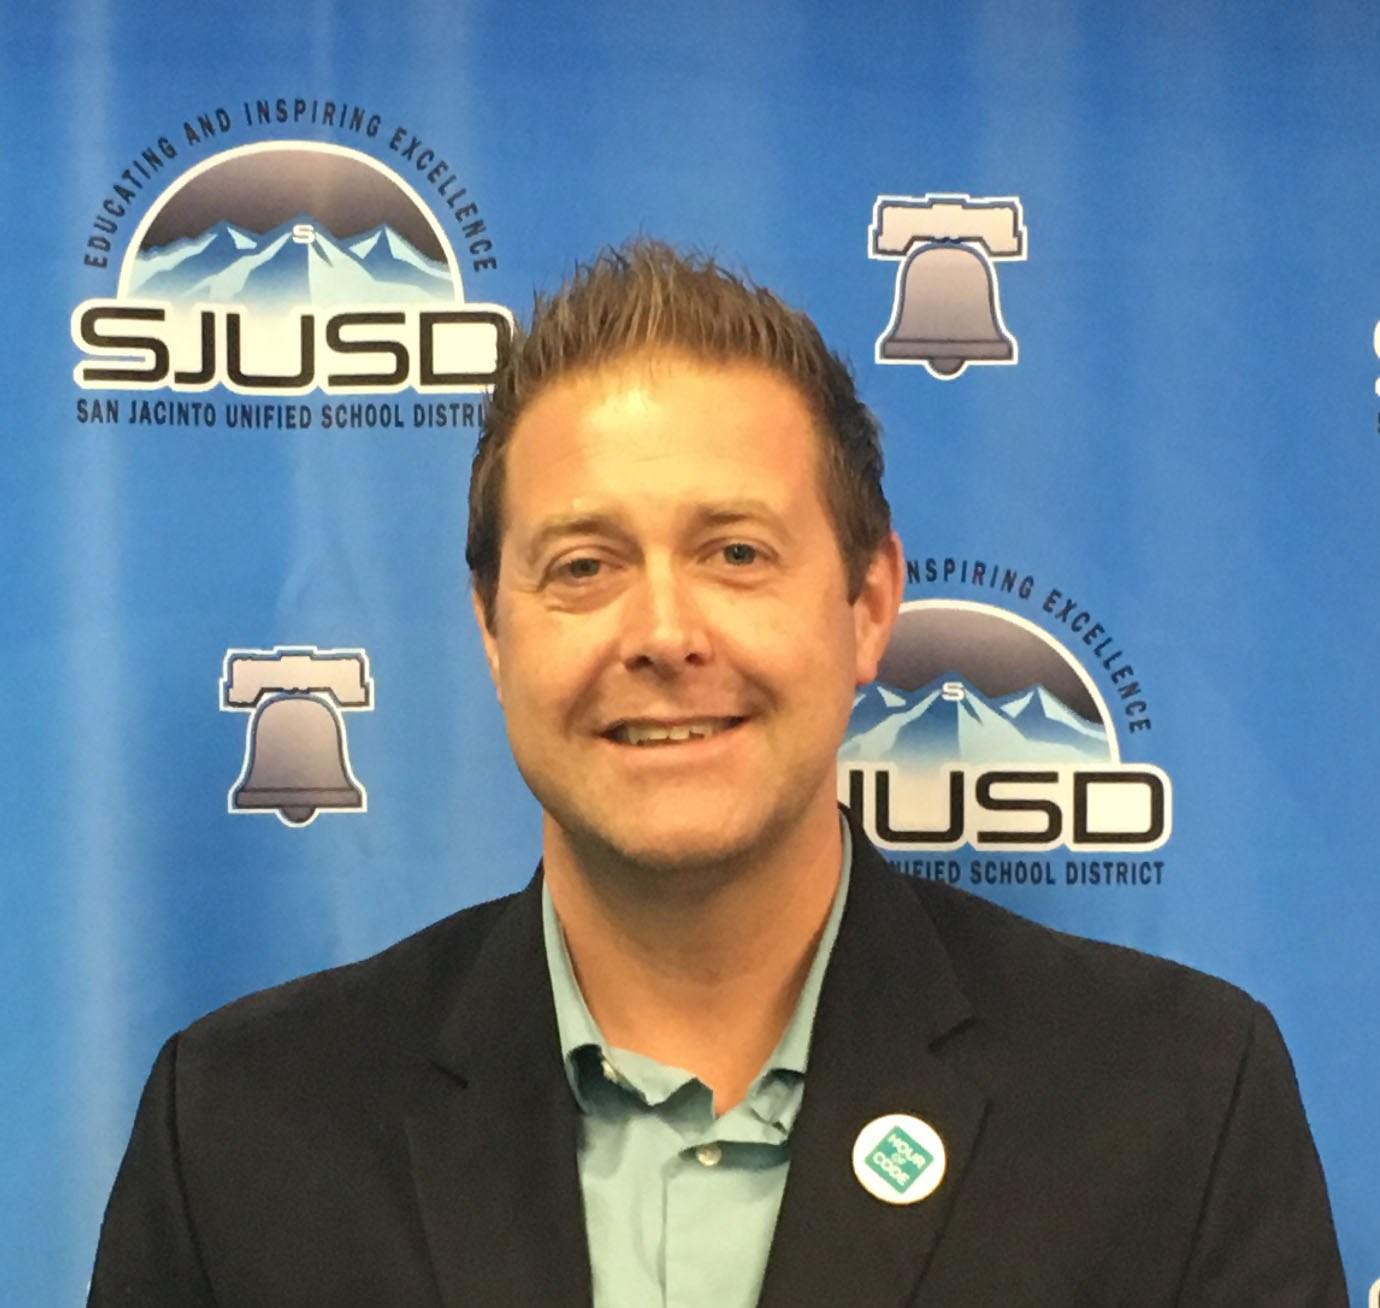 David Sheiner, Coordinator of Education Technology